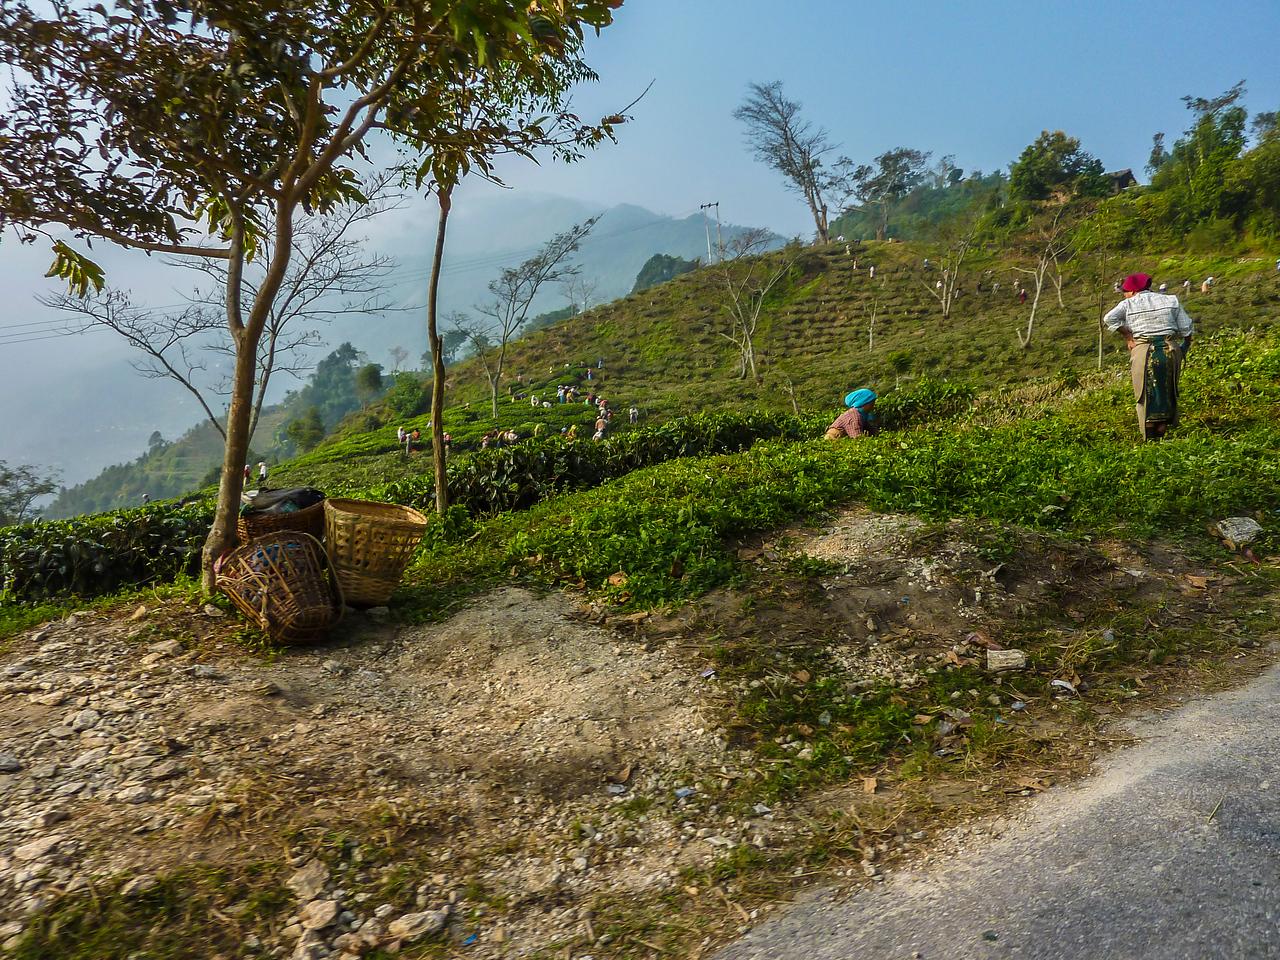 Driving from Darjeeling to Bagdogra, Sikkim